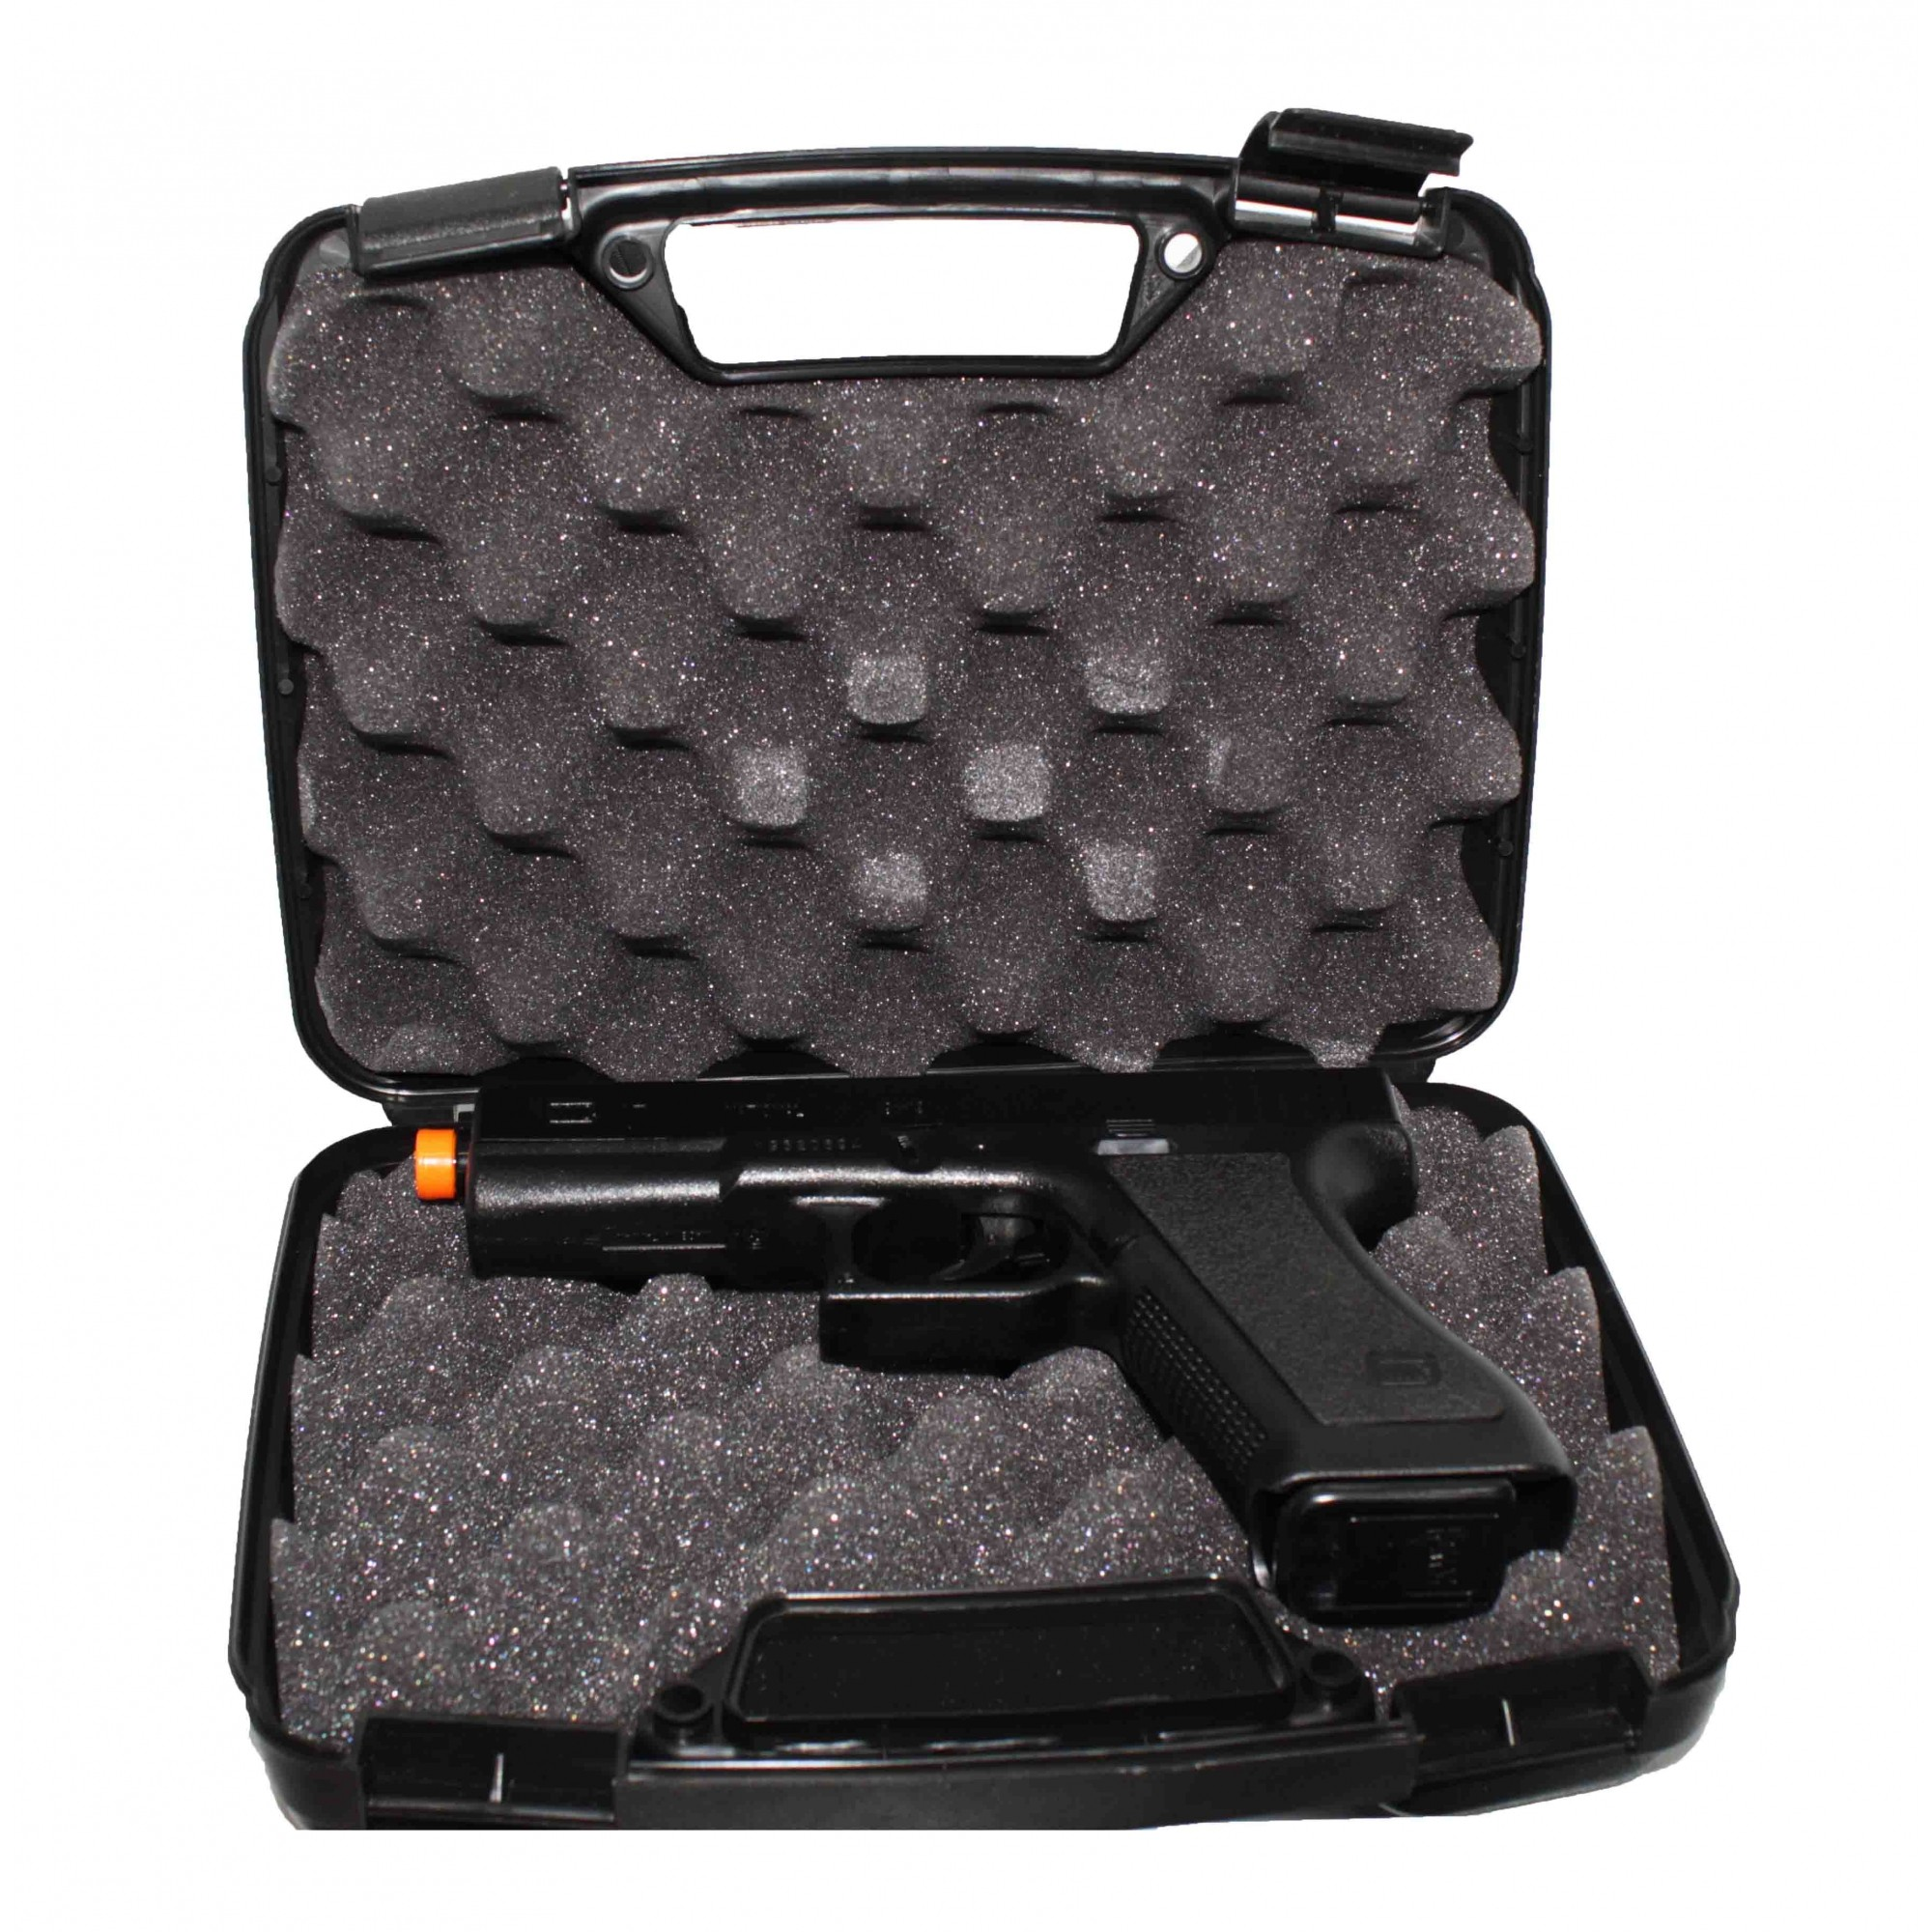 Maleta Case Rigida Para Armas 805